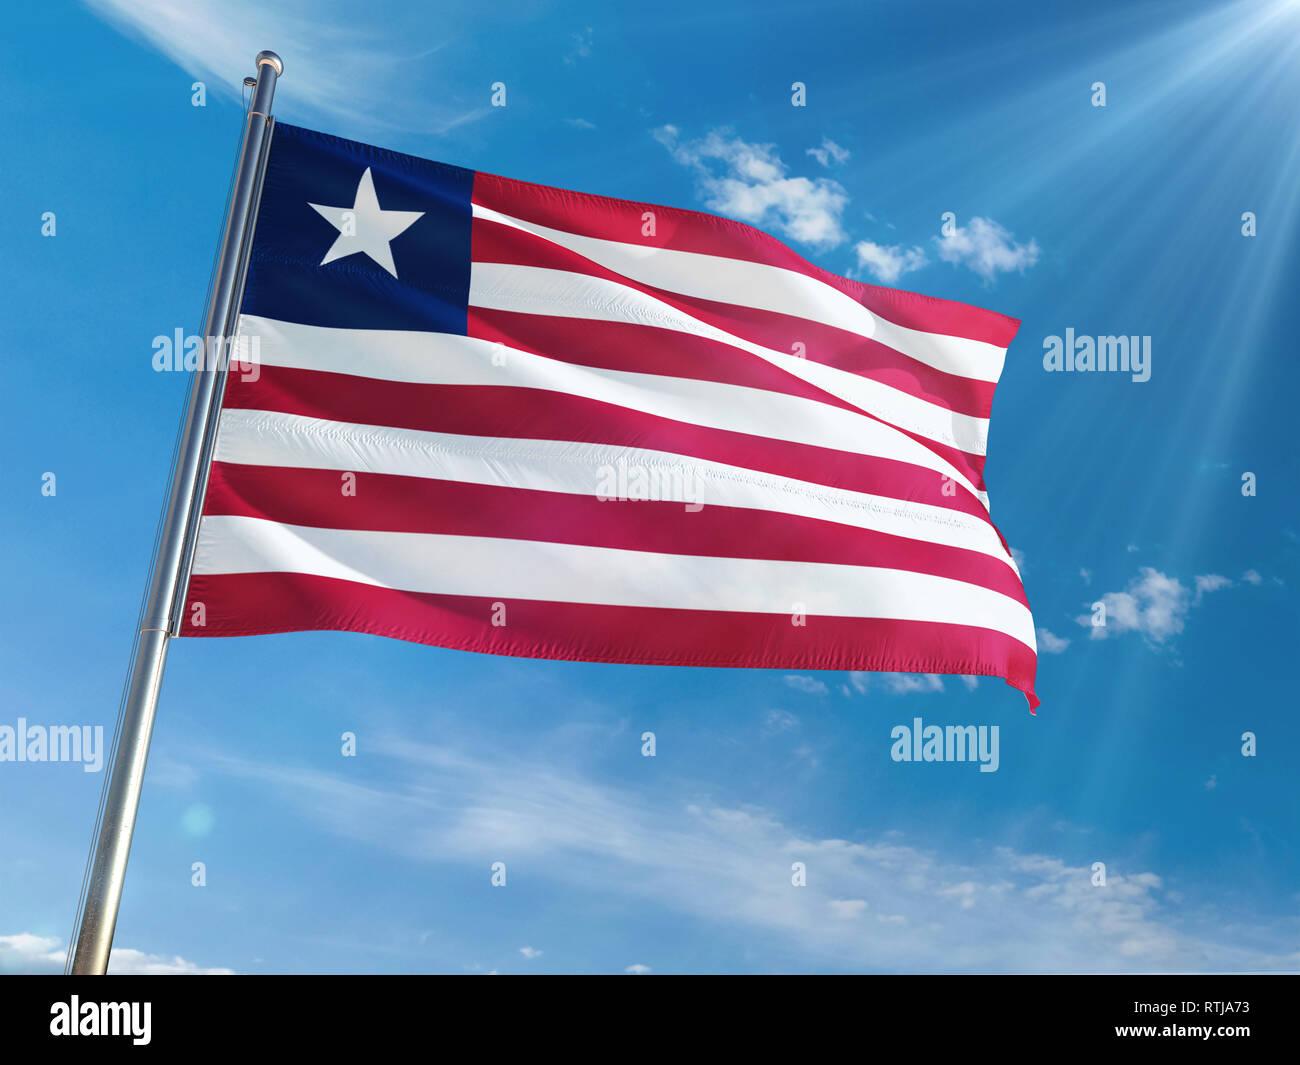 Liberia National Flag Waving on pole against sunny blue sky background. High Definition - Stock Image